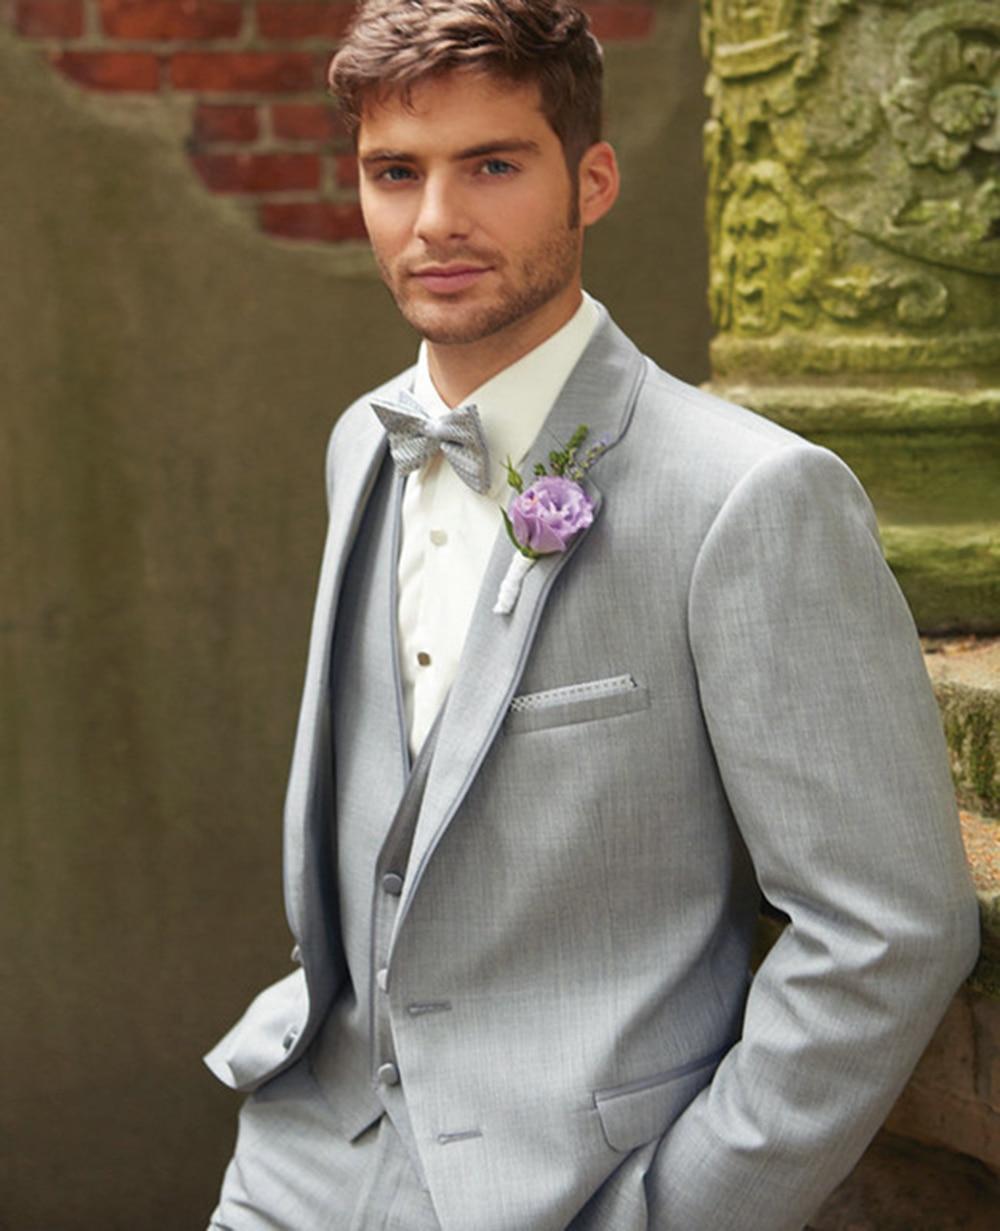 Gray-Three-Pieces-Groom-Suit-Custom-Made-Tuxedos-For-Men-Groomsman-Bridegroom-Wedding-Best-Man-Suits.jpg_640x640